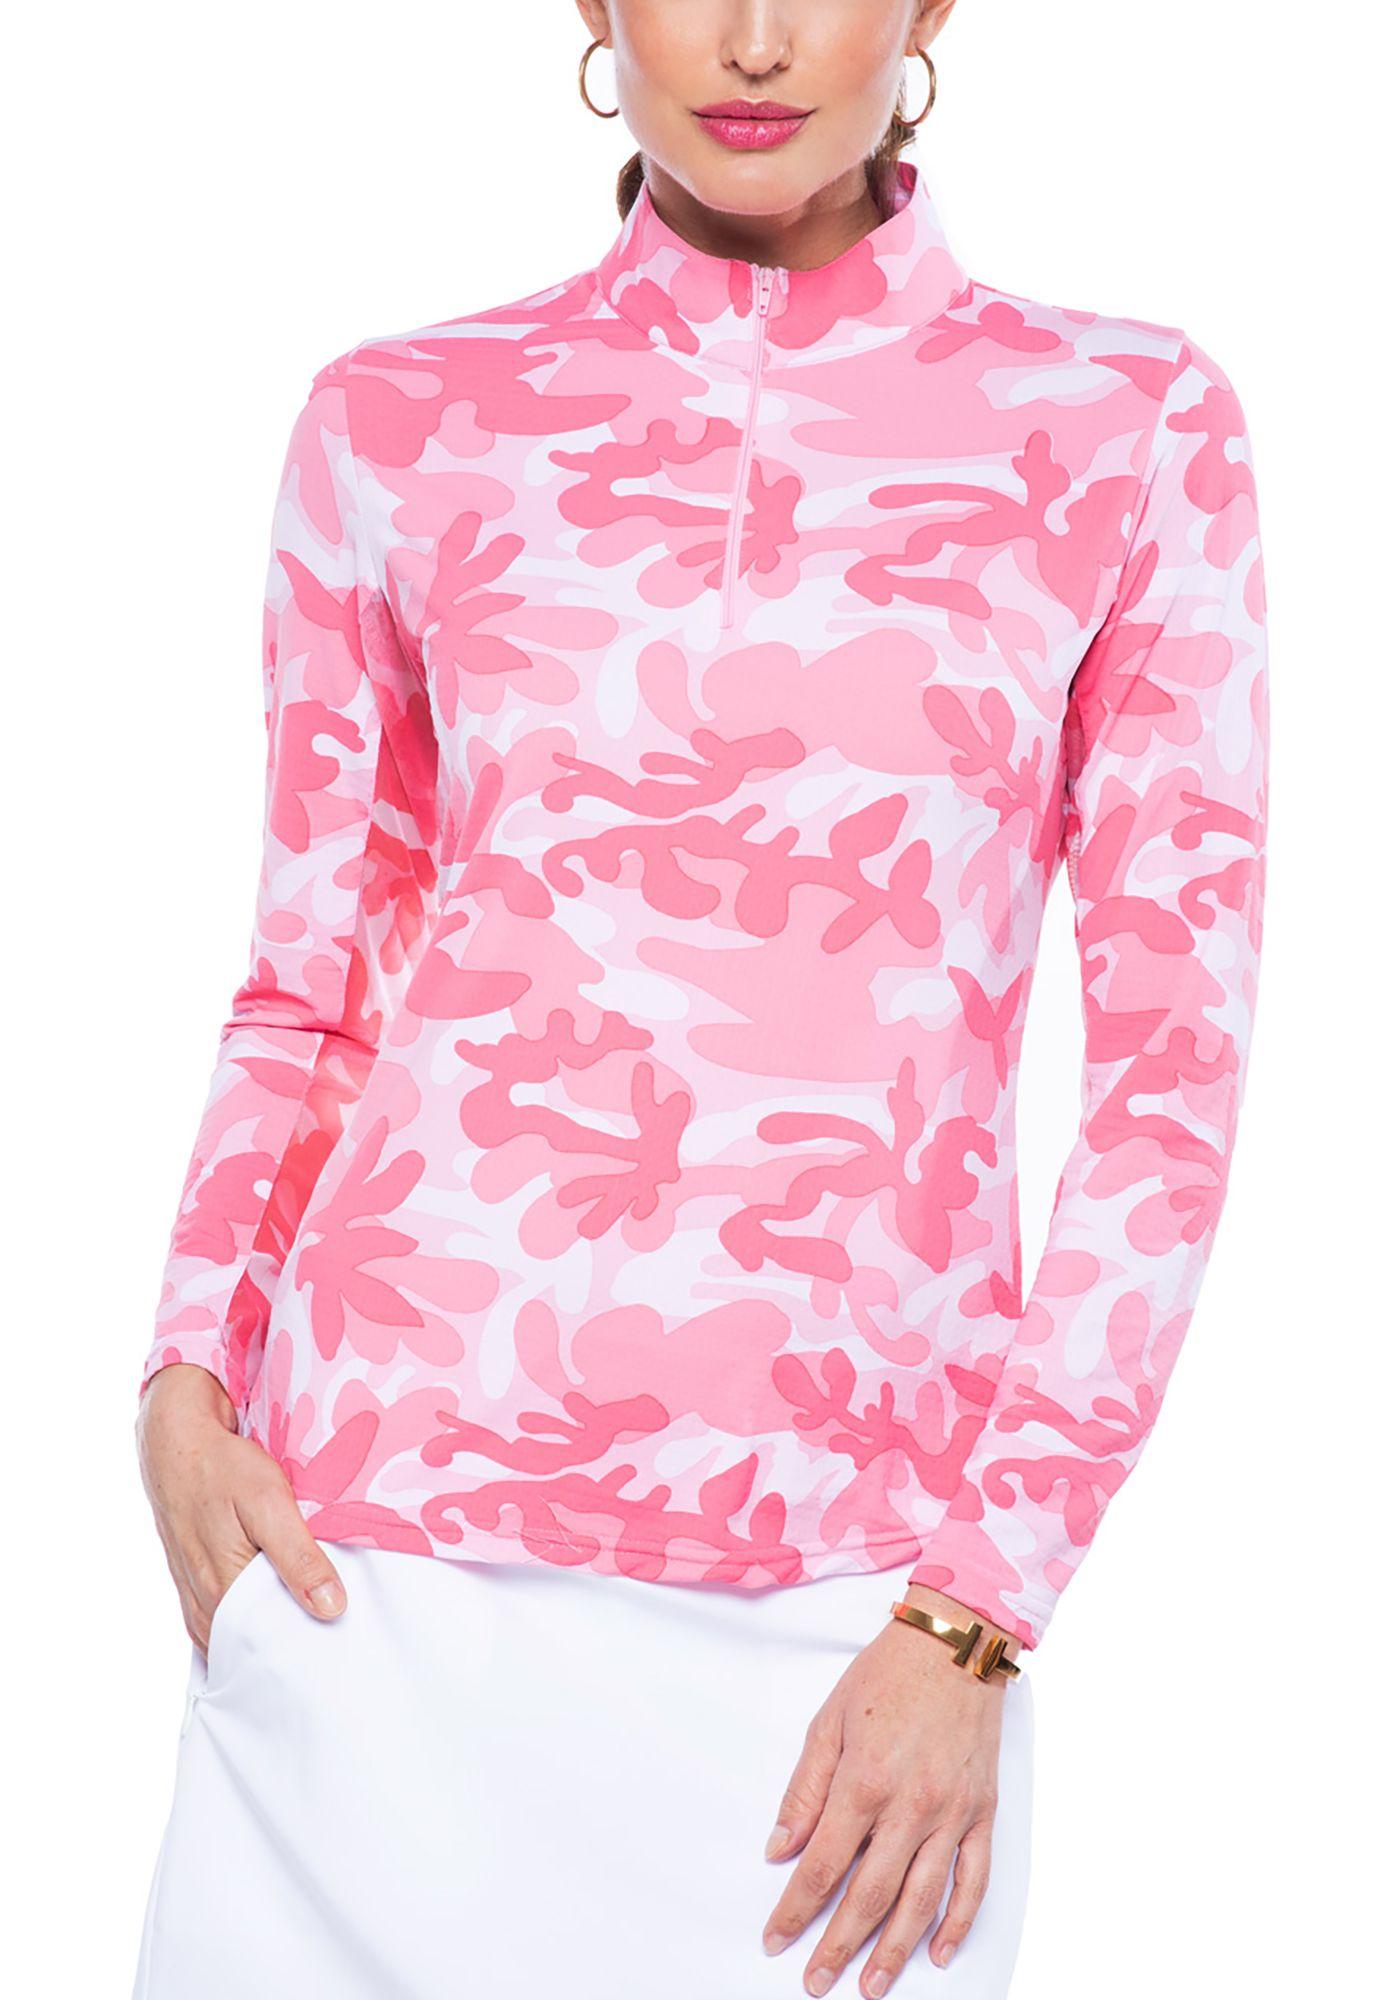 IBKUL Women's Camo Print Mock Neck Golf Pullover